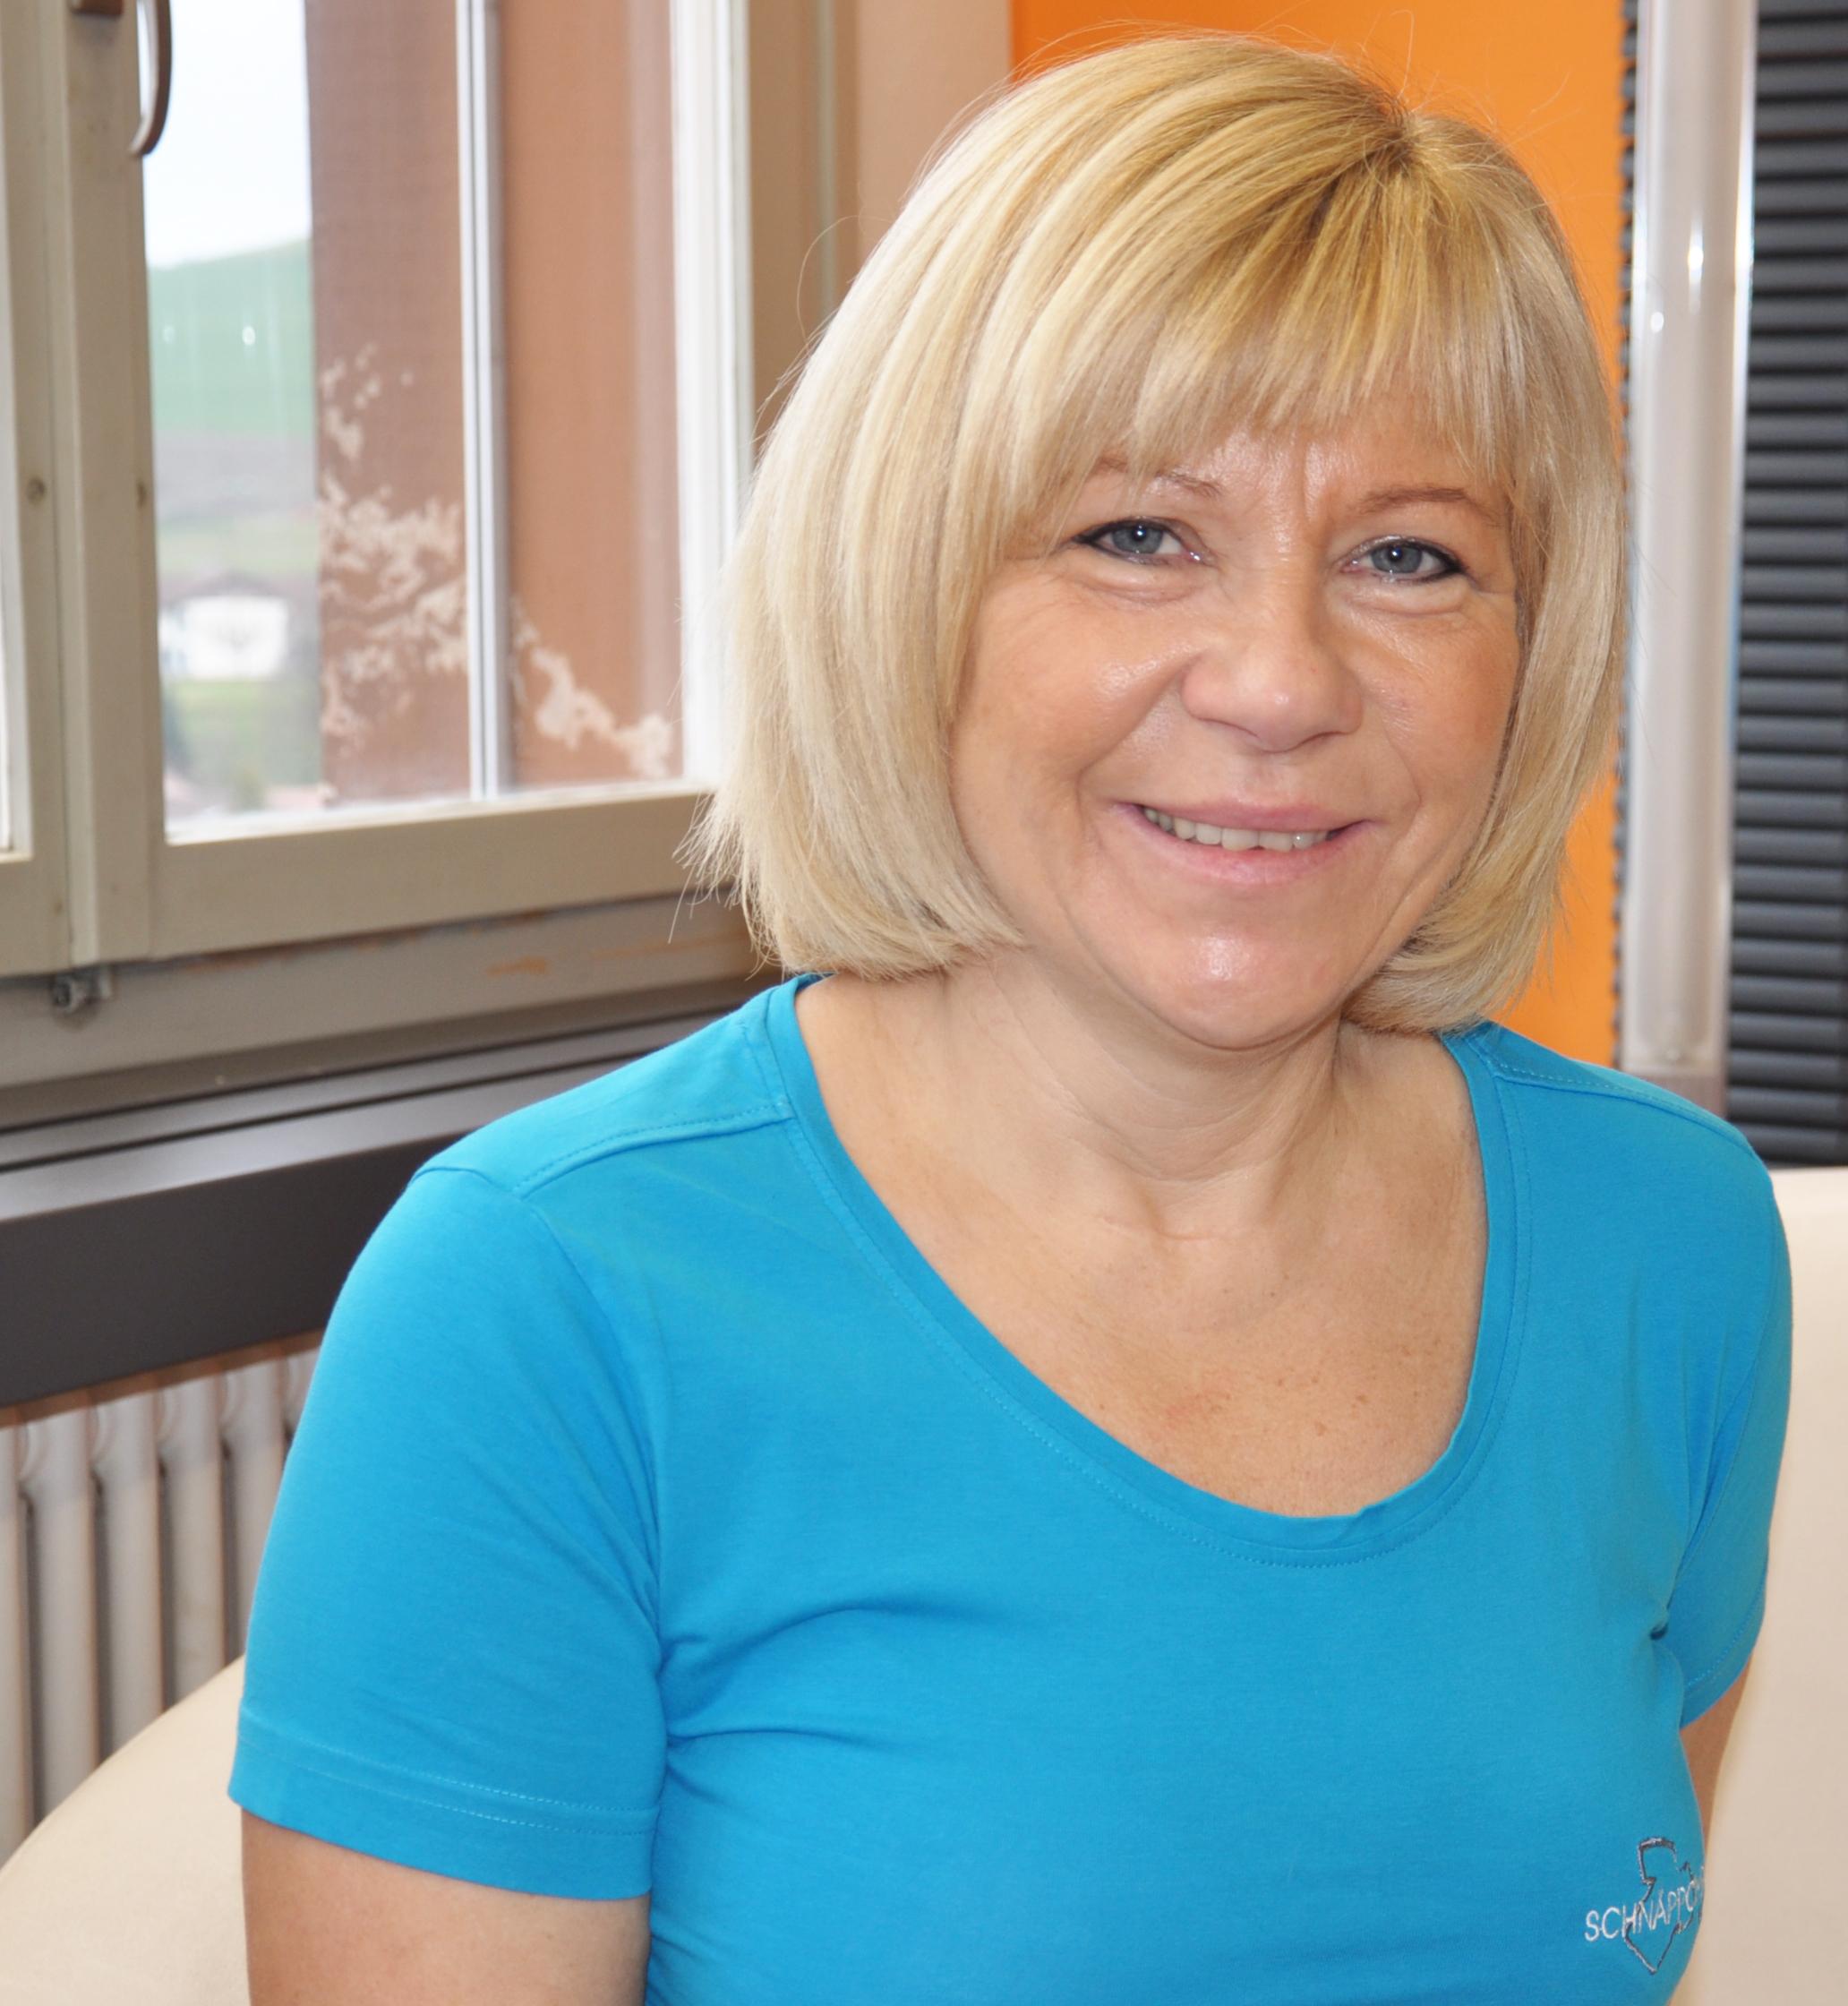 Brigitte Rüegsegger